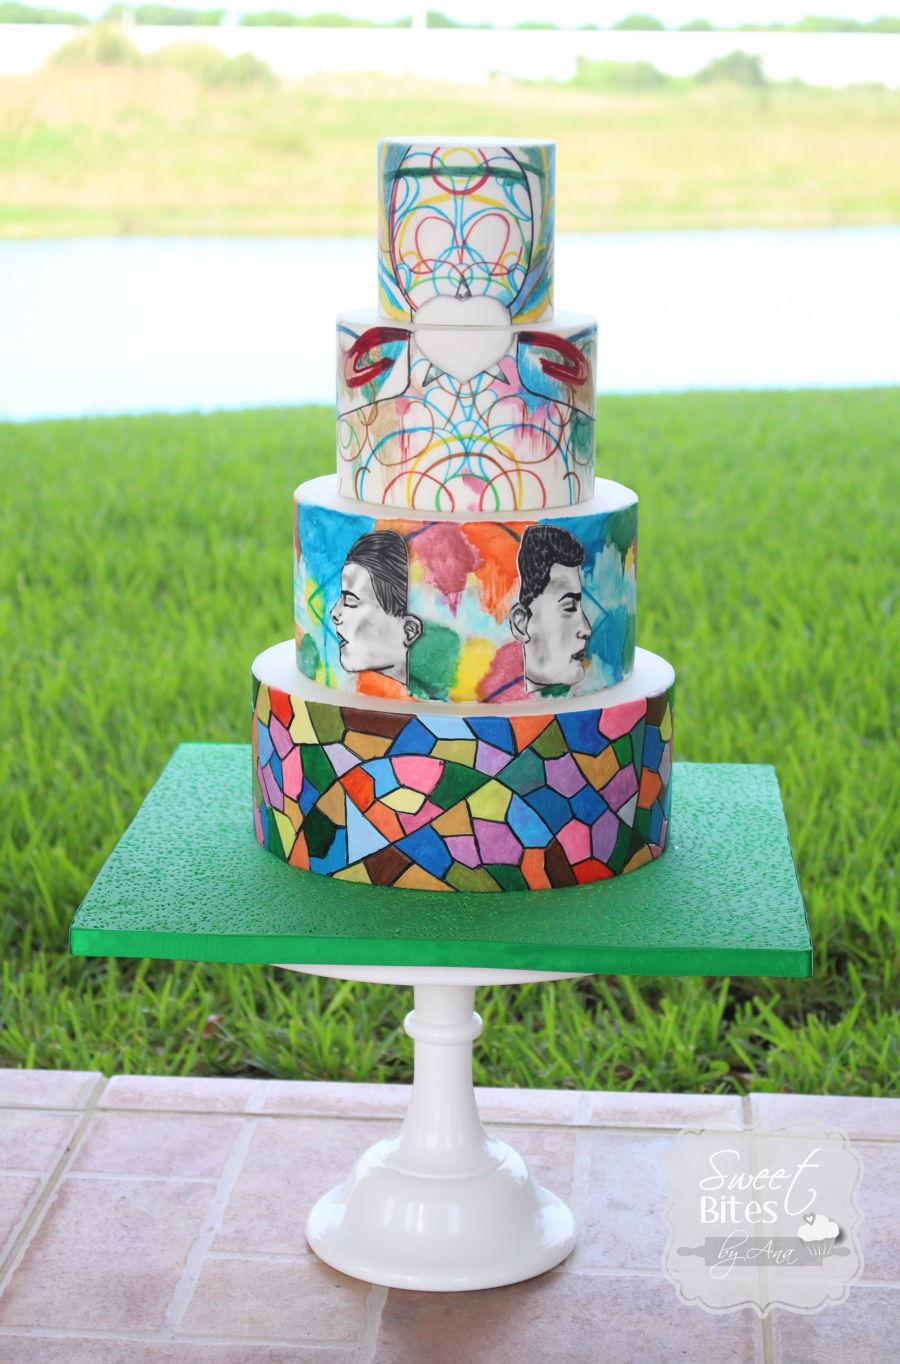 Cuties Street Art Cake Collaboration Cakecentral Com